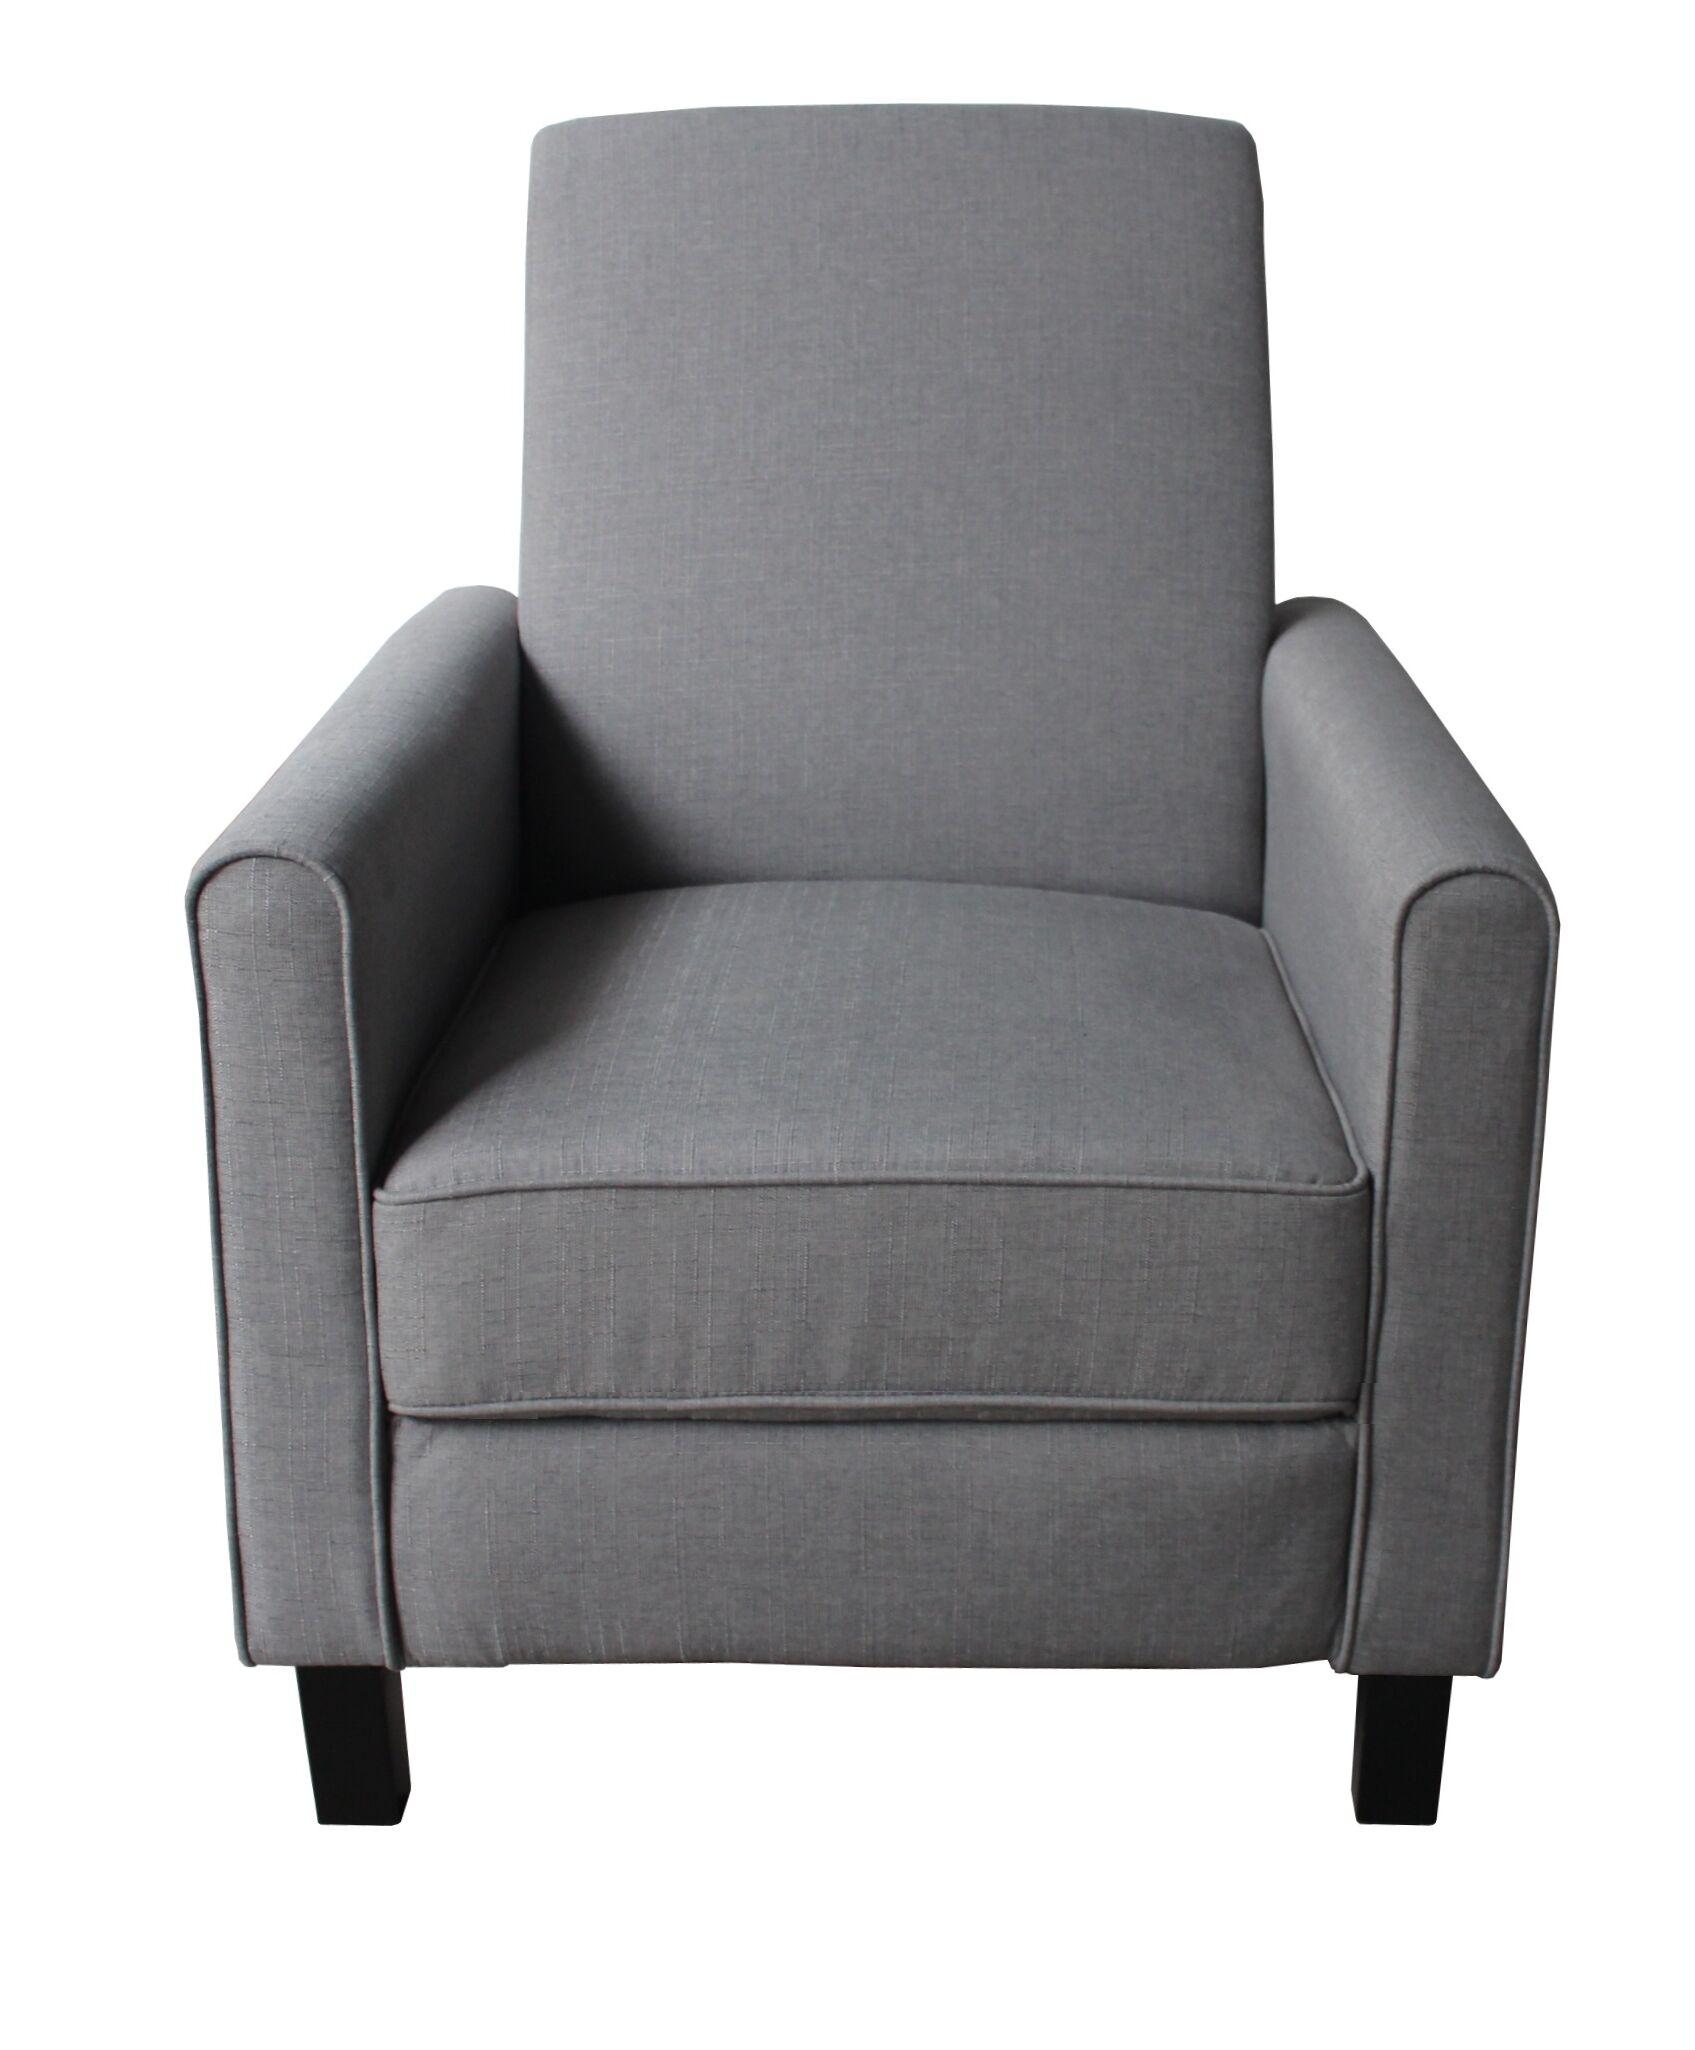 Fabric Manual Recliner Color: Dark Gray